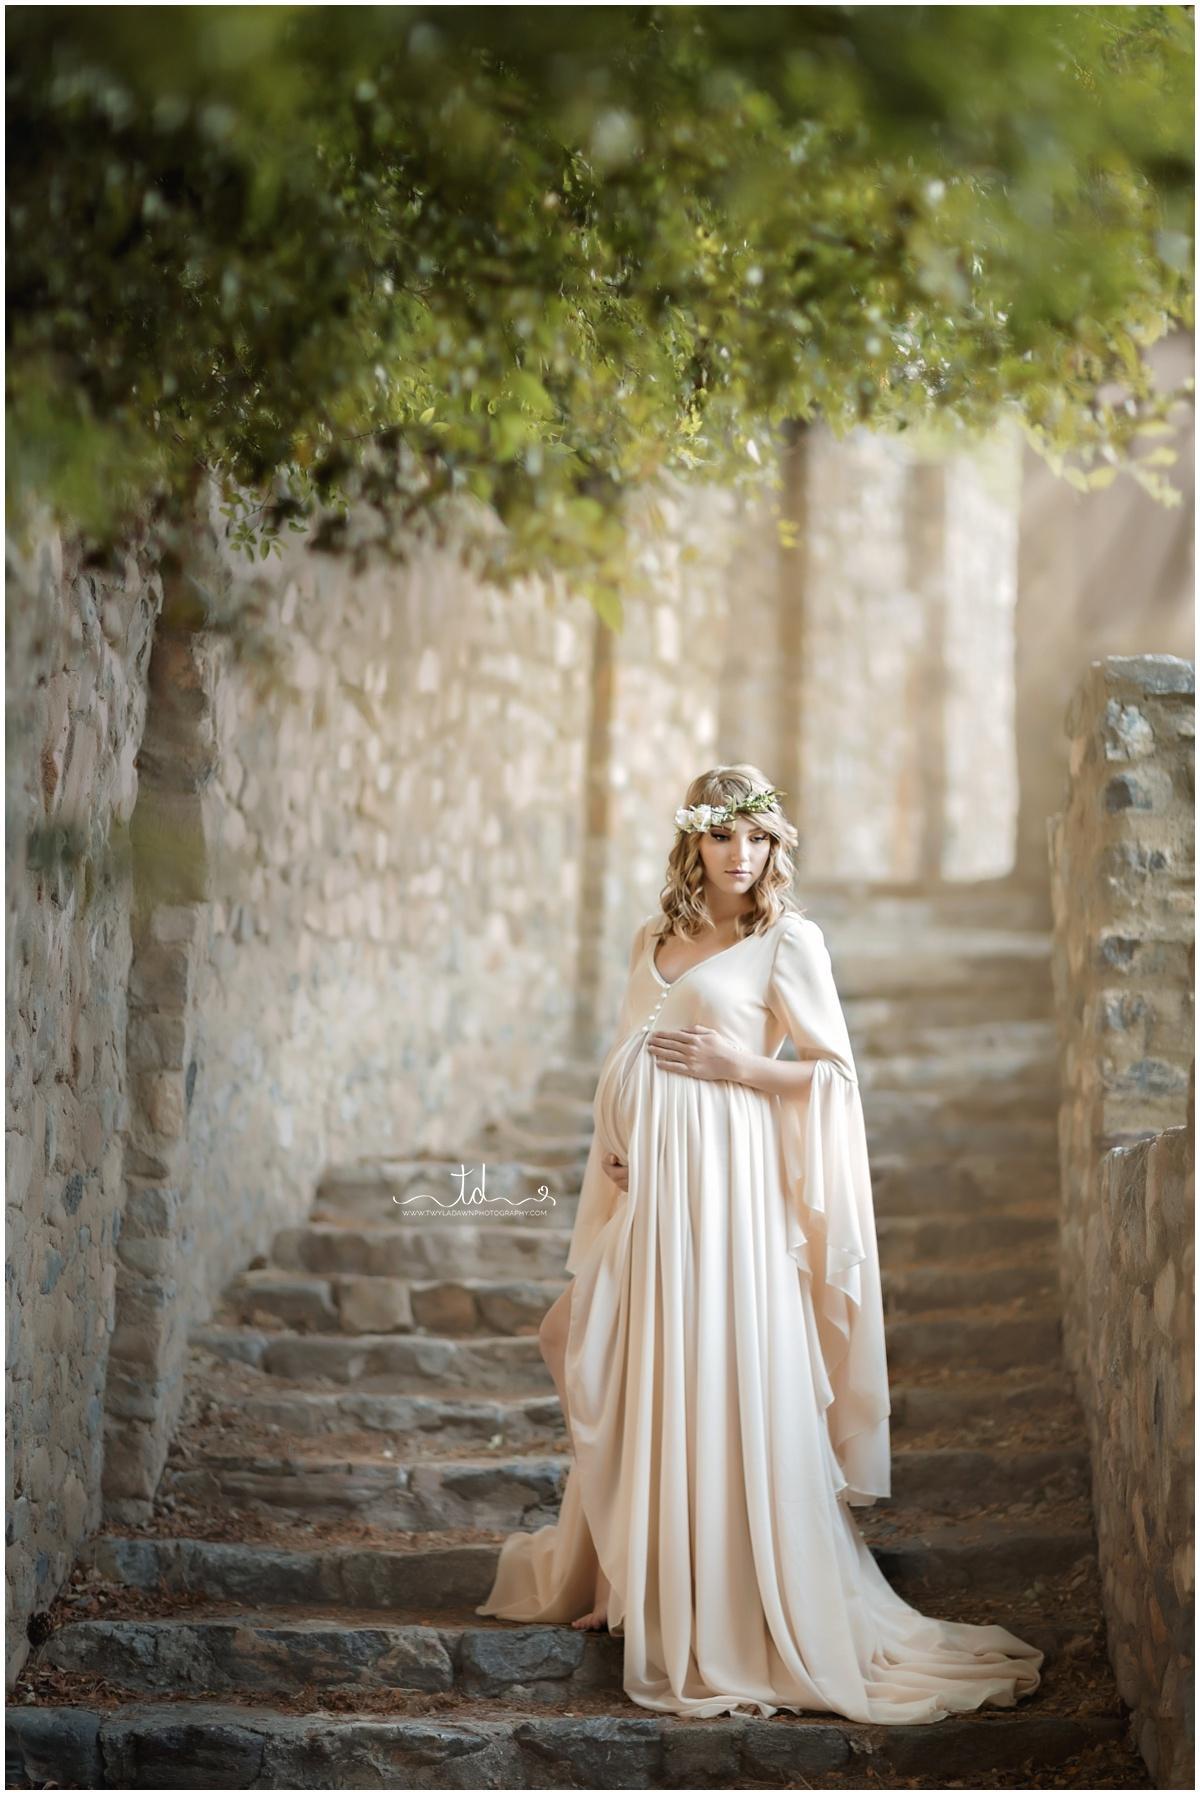 The Lenora Robe in Champagne | Utah Maternity Photographer | Twyla Dawn Photography